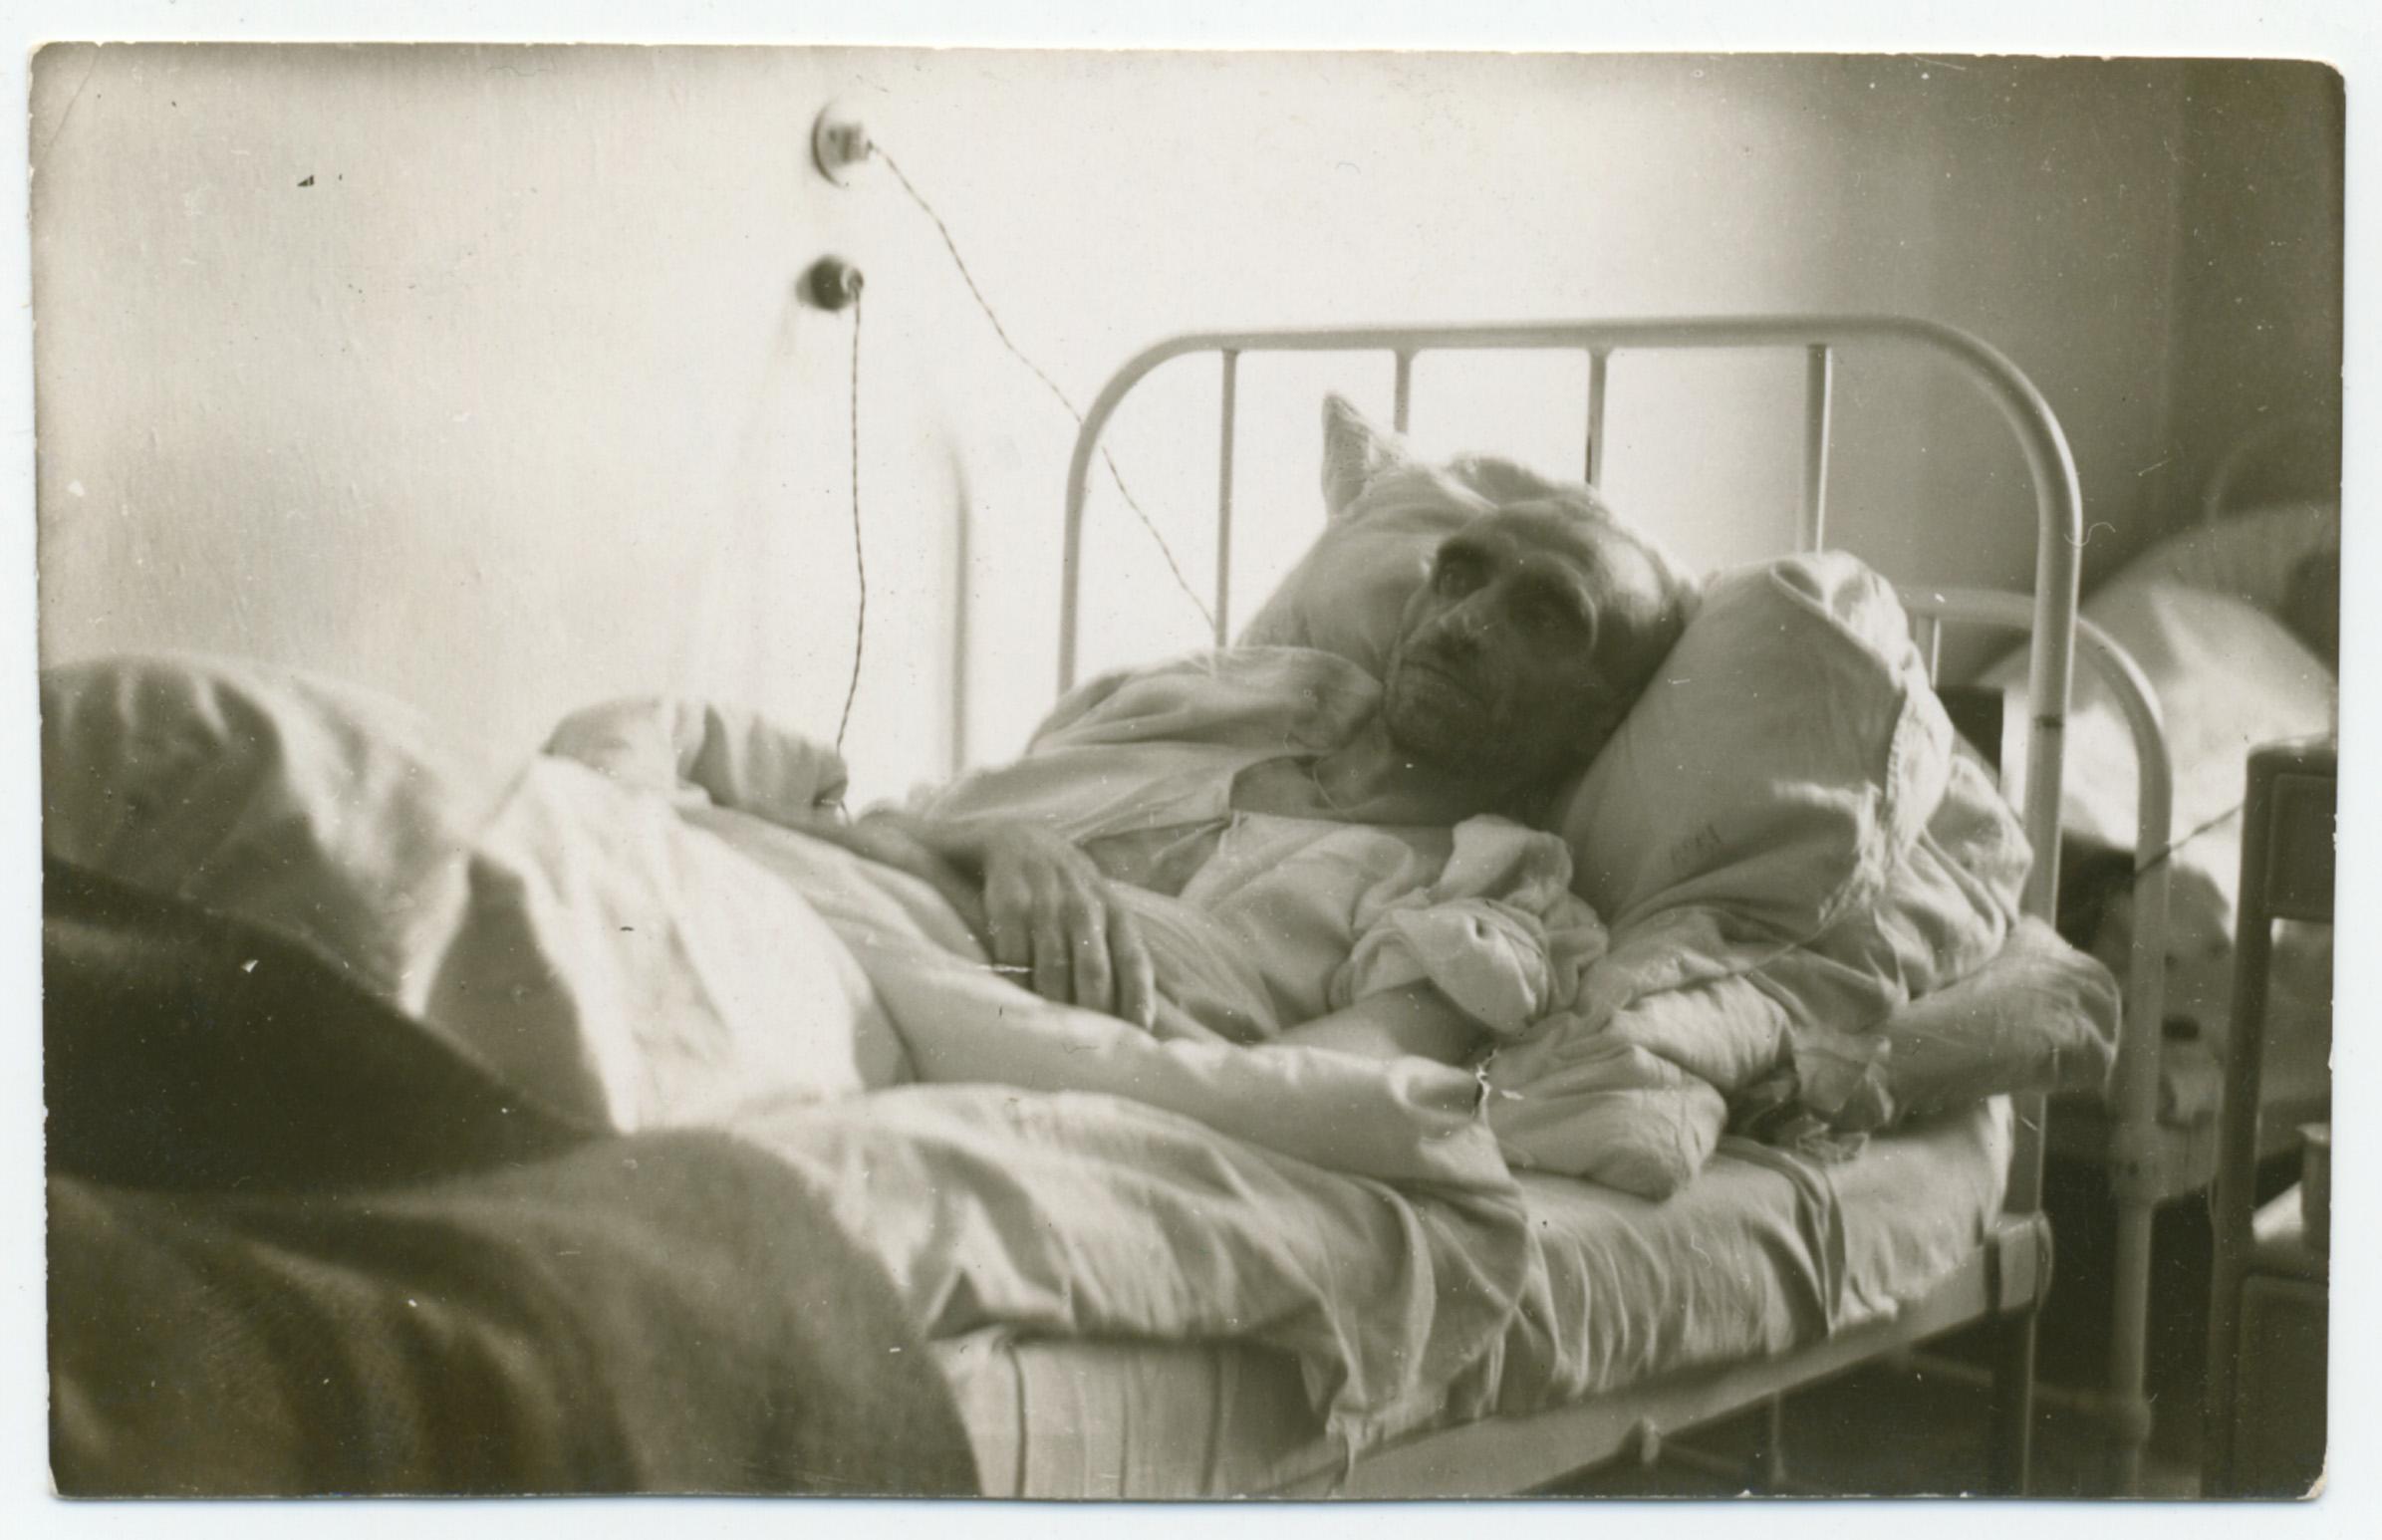 Stefan Kołaczkowski, Professor in Krakau, starb am 16. Februar 1940 an den Folgen des KZ-Aufenthalts